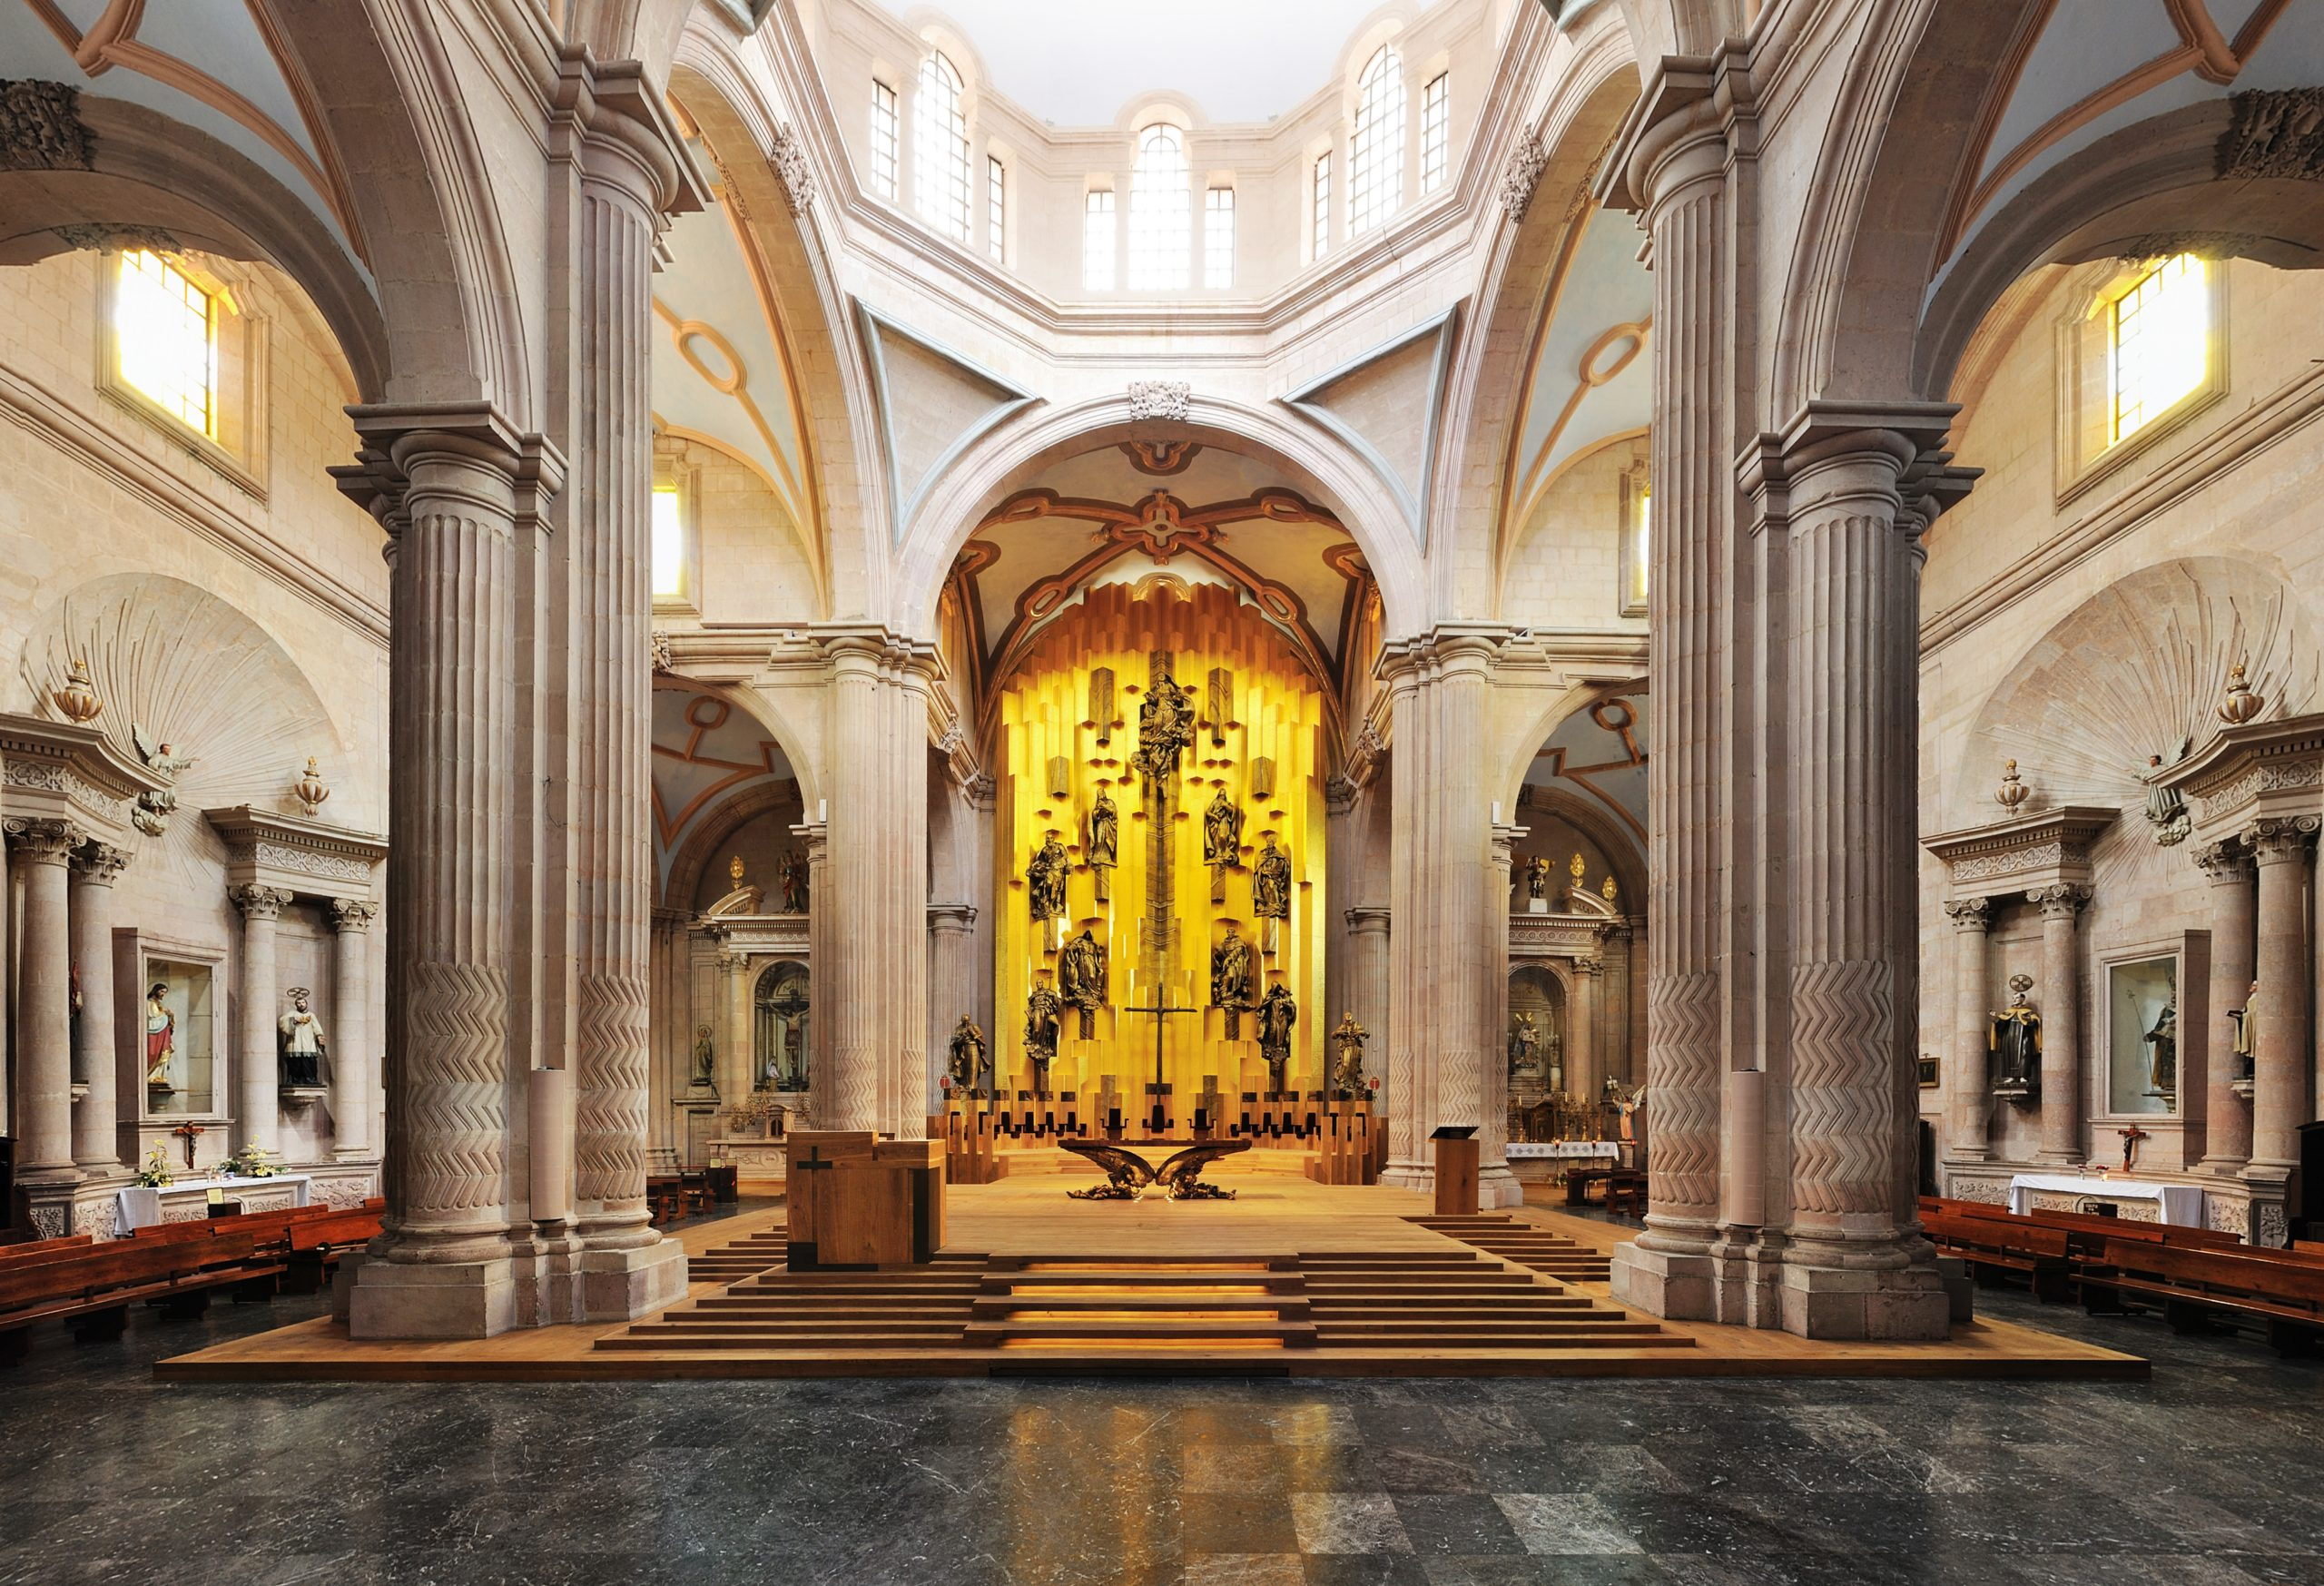 Gilded altar, Mexico